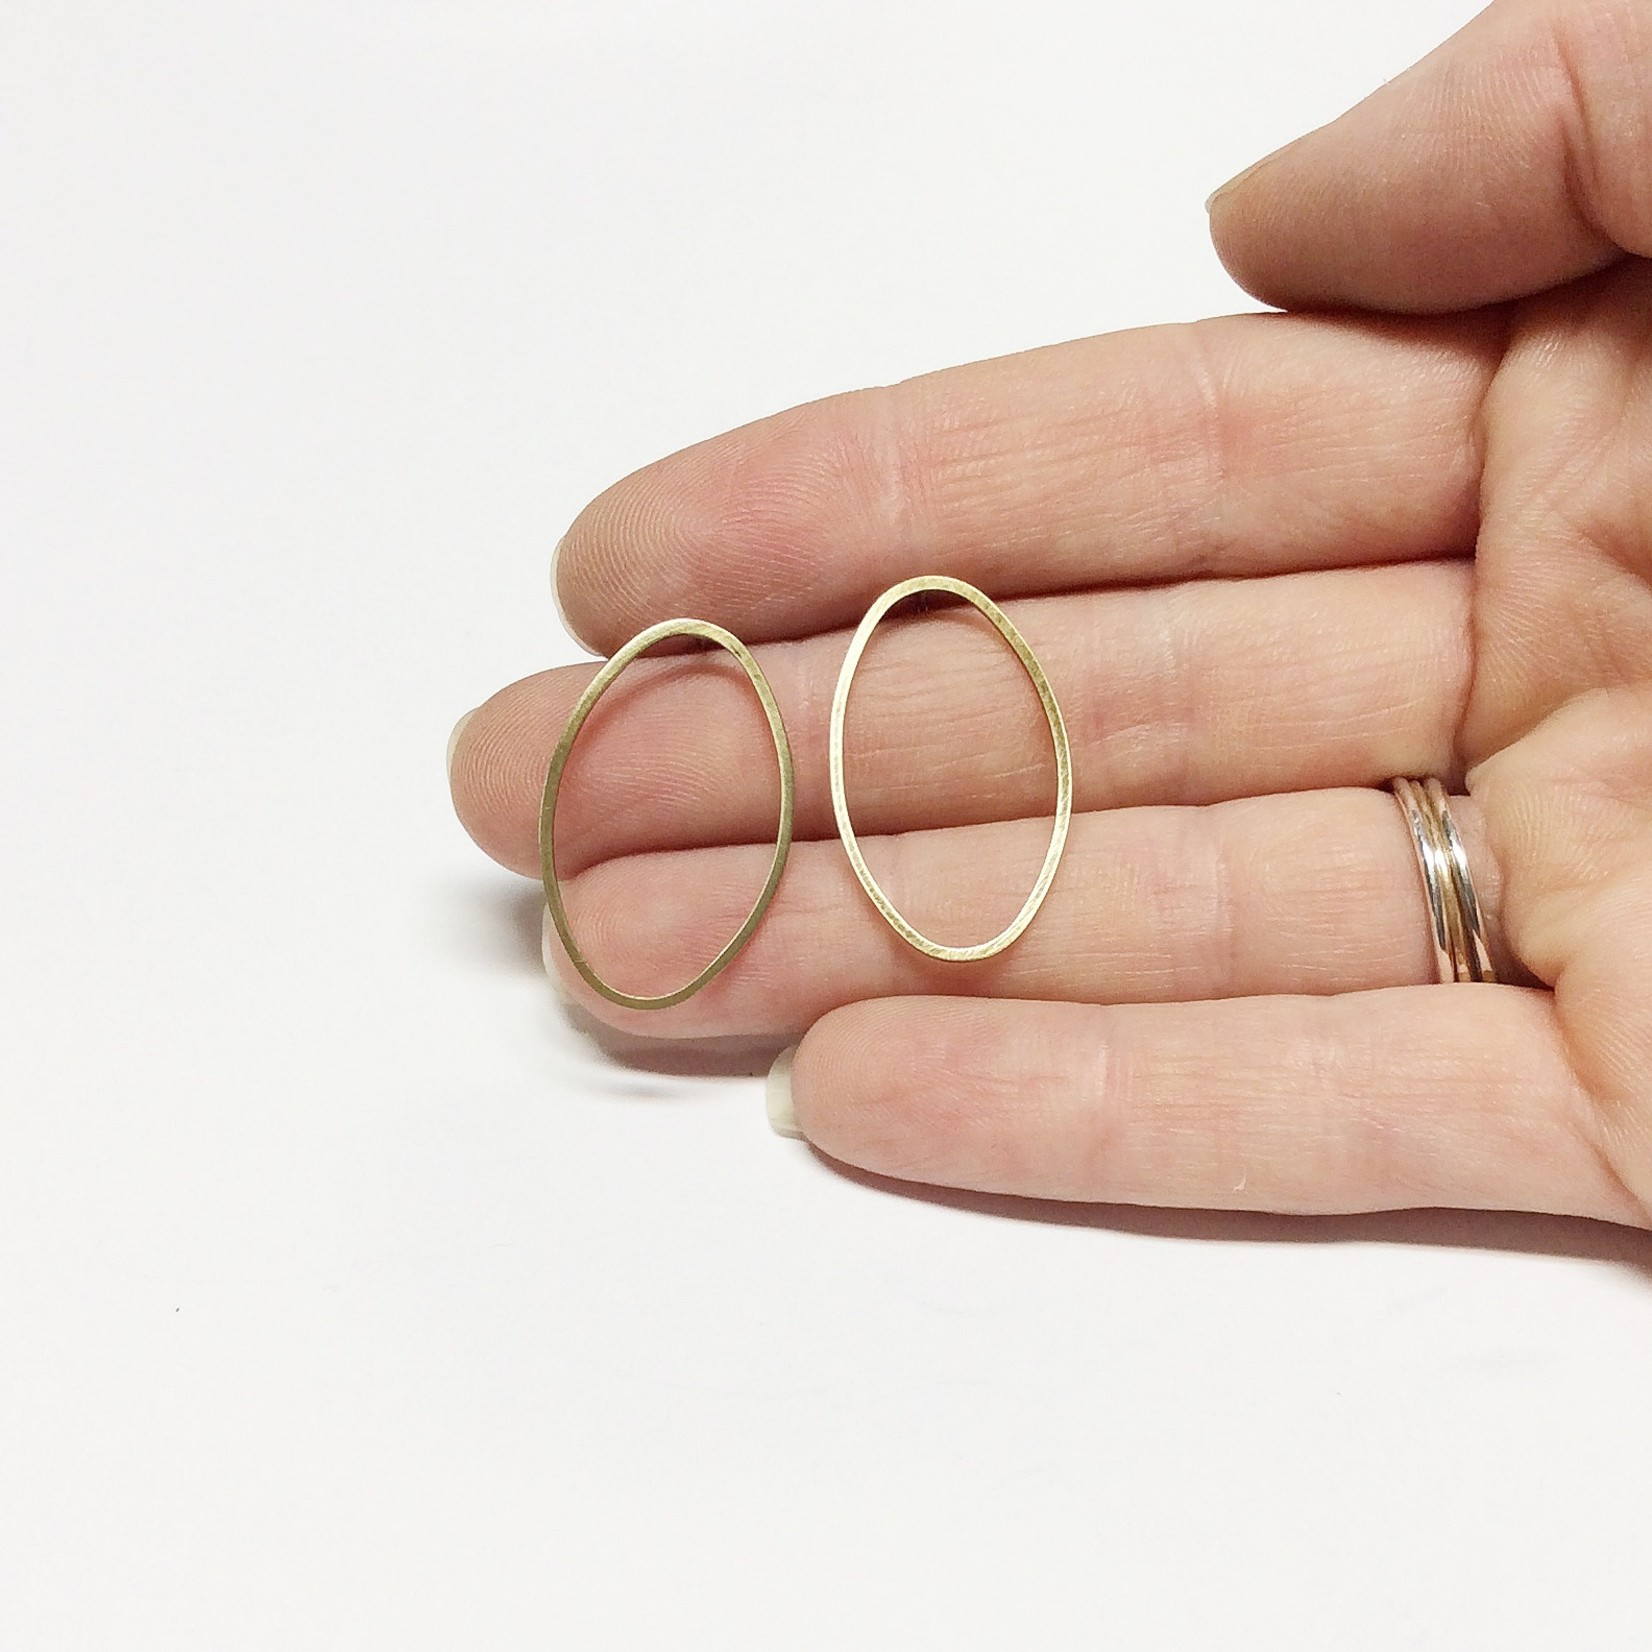 Inimini Homemade Brass thin oval